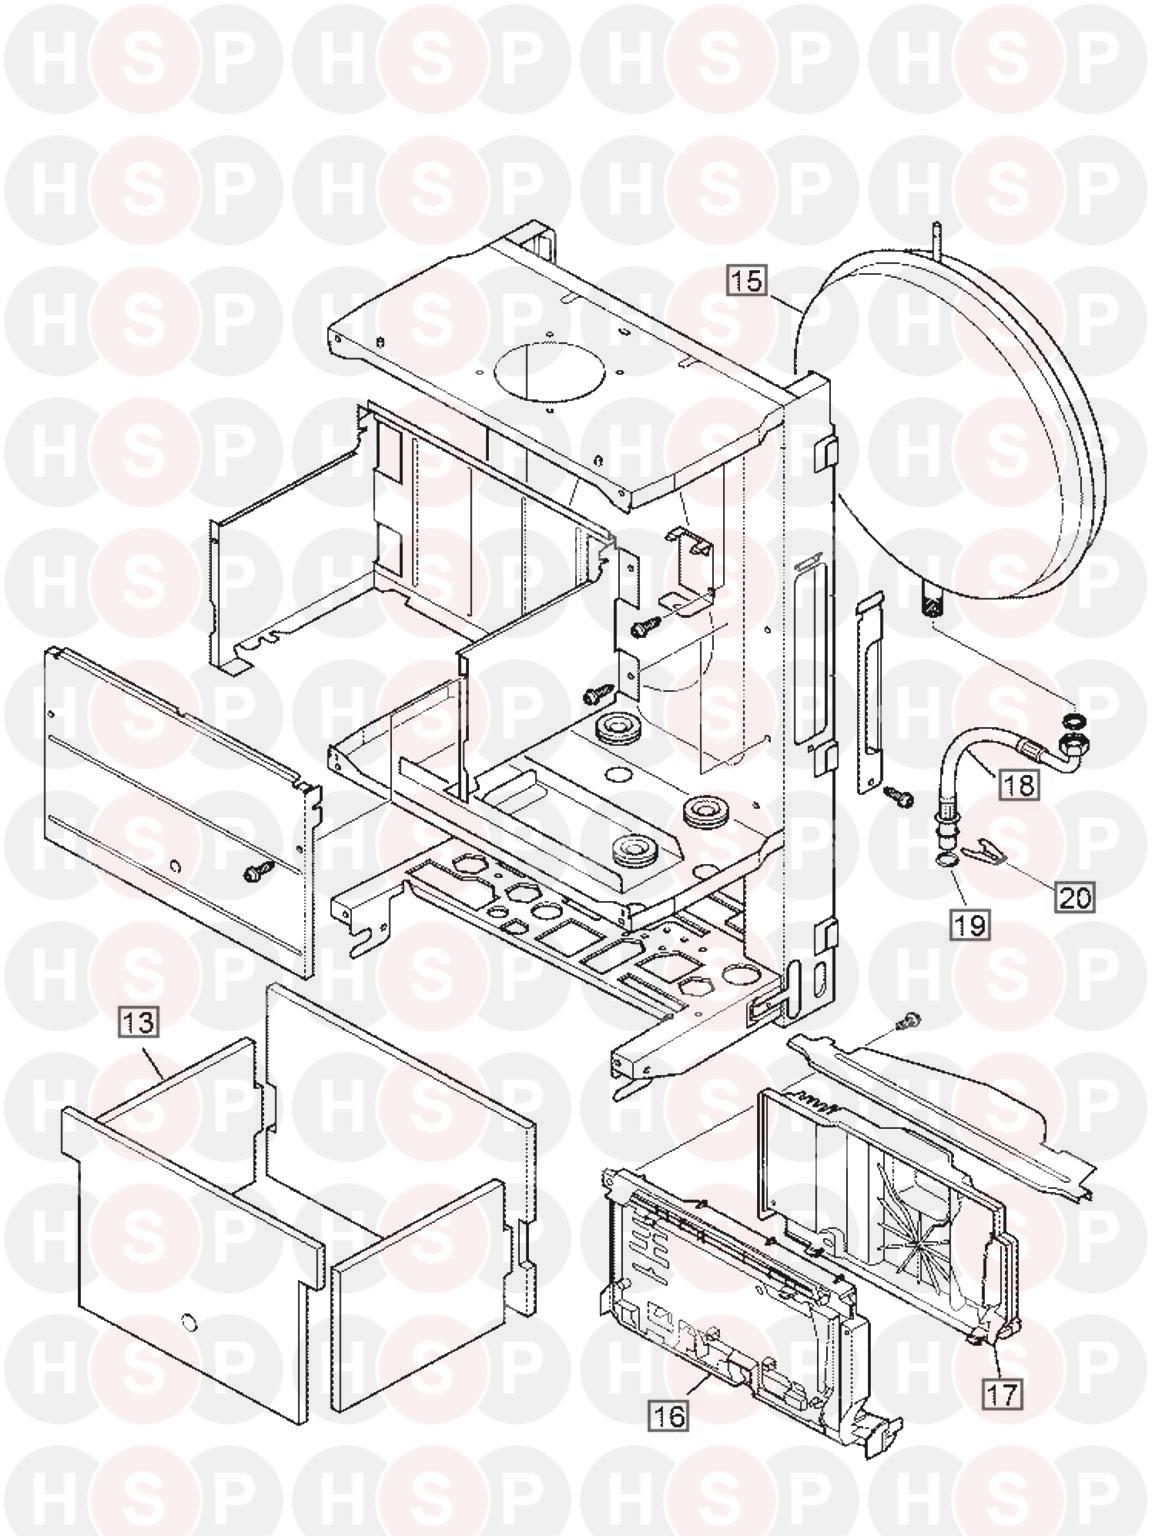 Glowworm GLOWWORM 24CI (EXPANSION VESSEL) Diagram | Heating Spare Parts